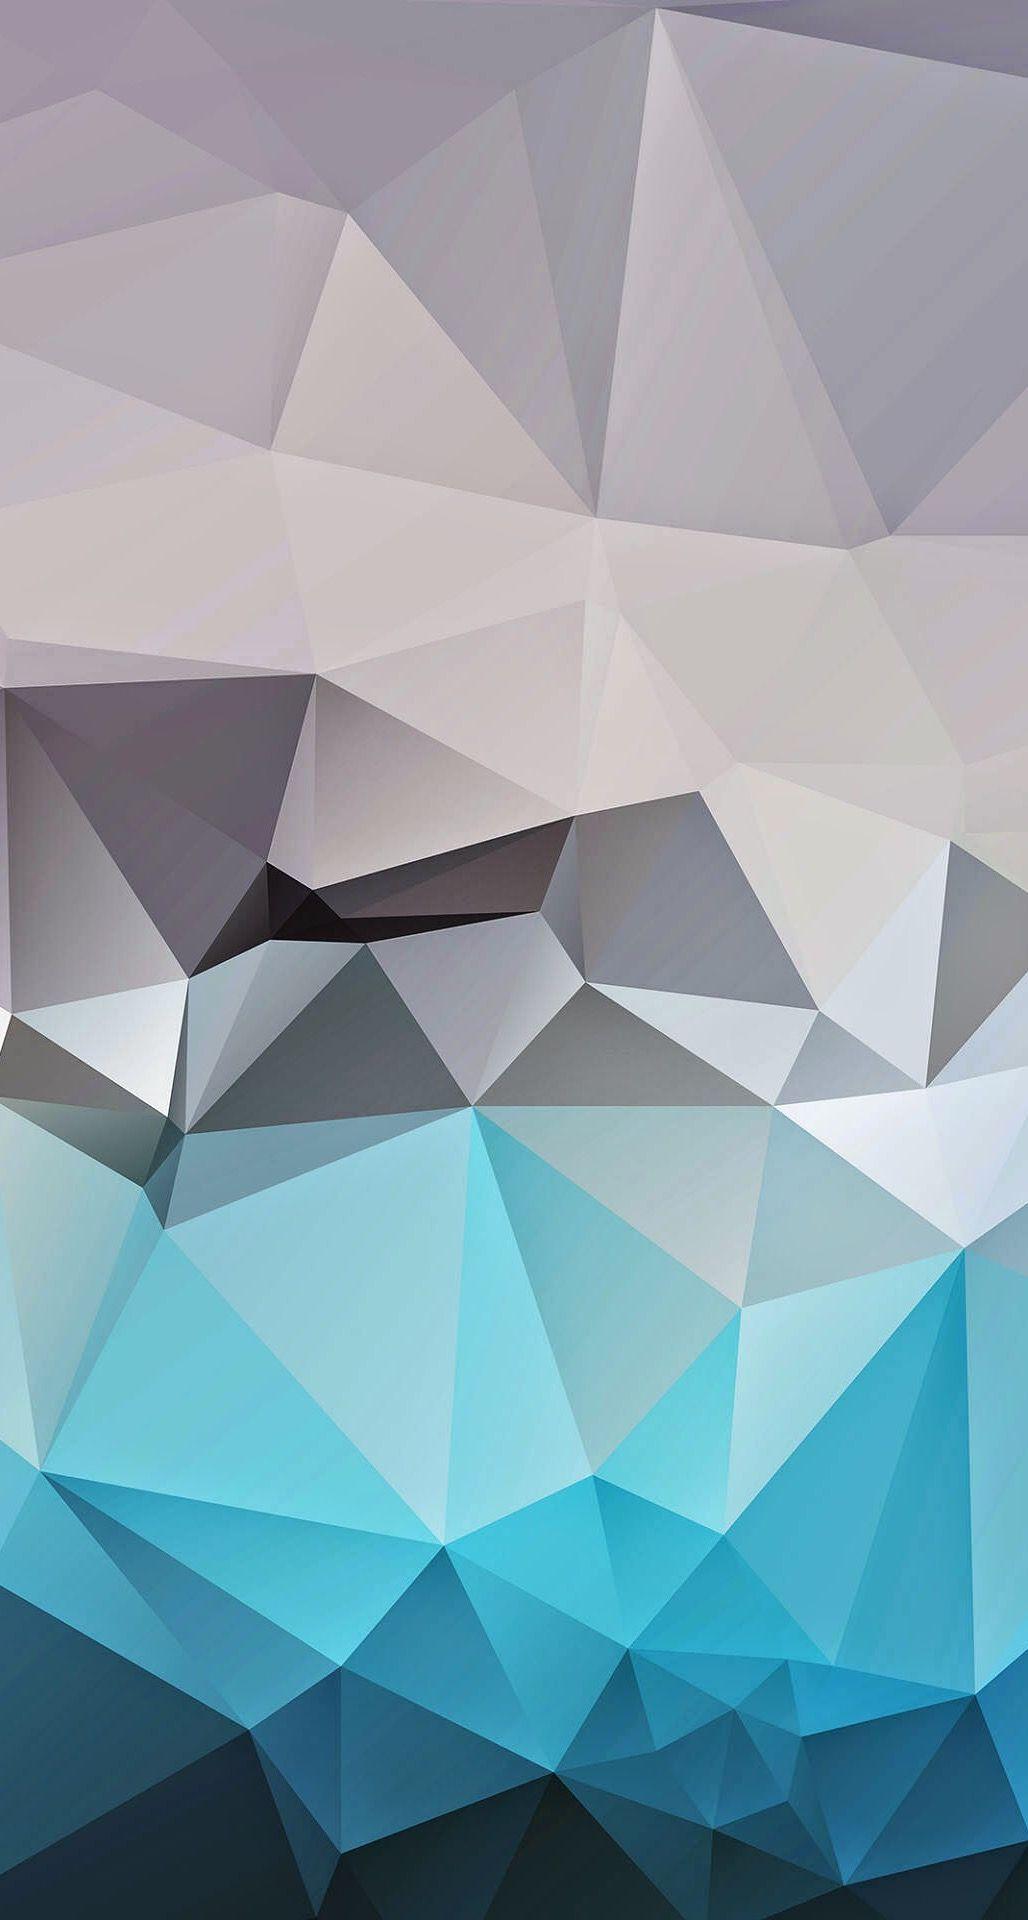 Grey Iphone X Wallpaper Jailbreak Wallpapers Wallpaper Cave